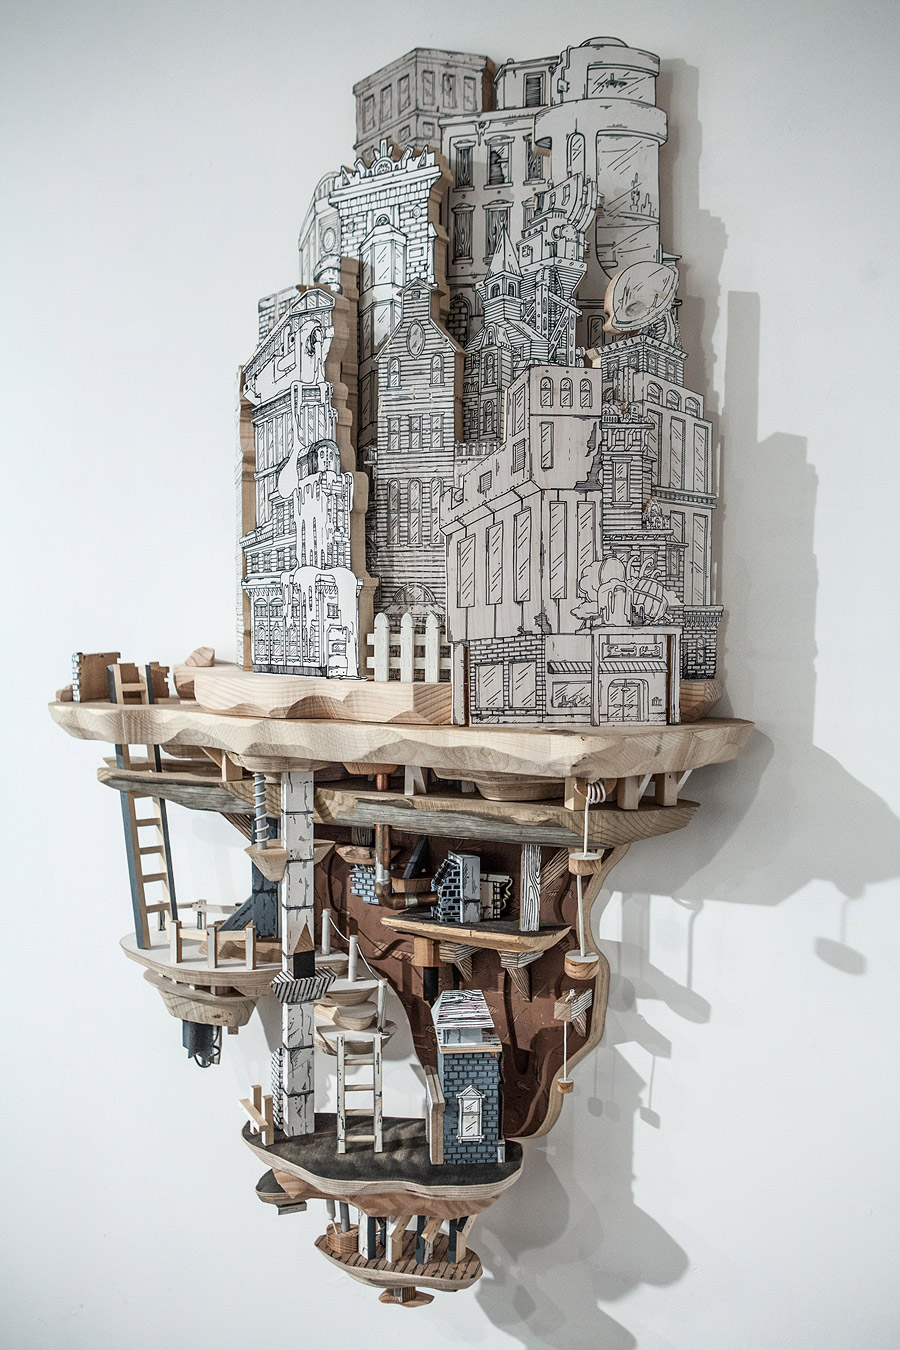 artist luke o u2019sullivan combines drawings and sculptures to